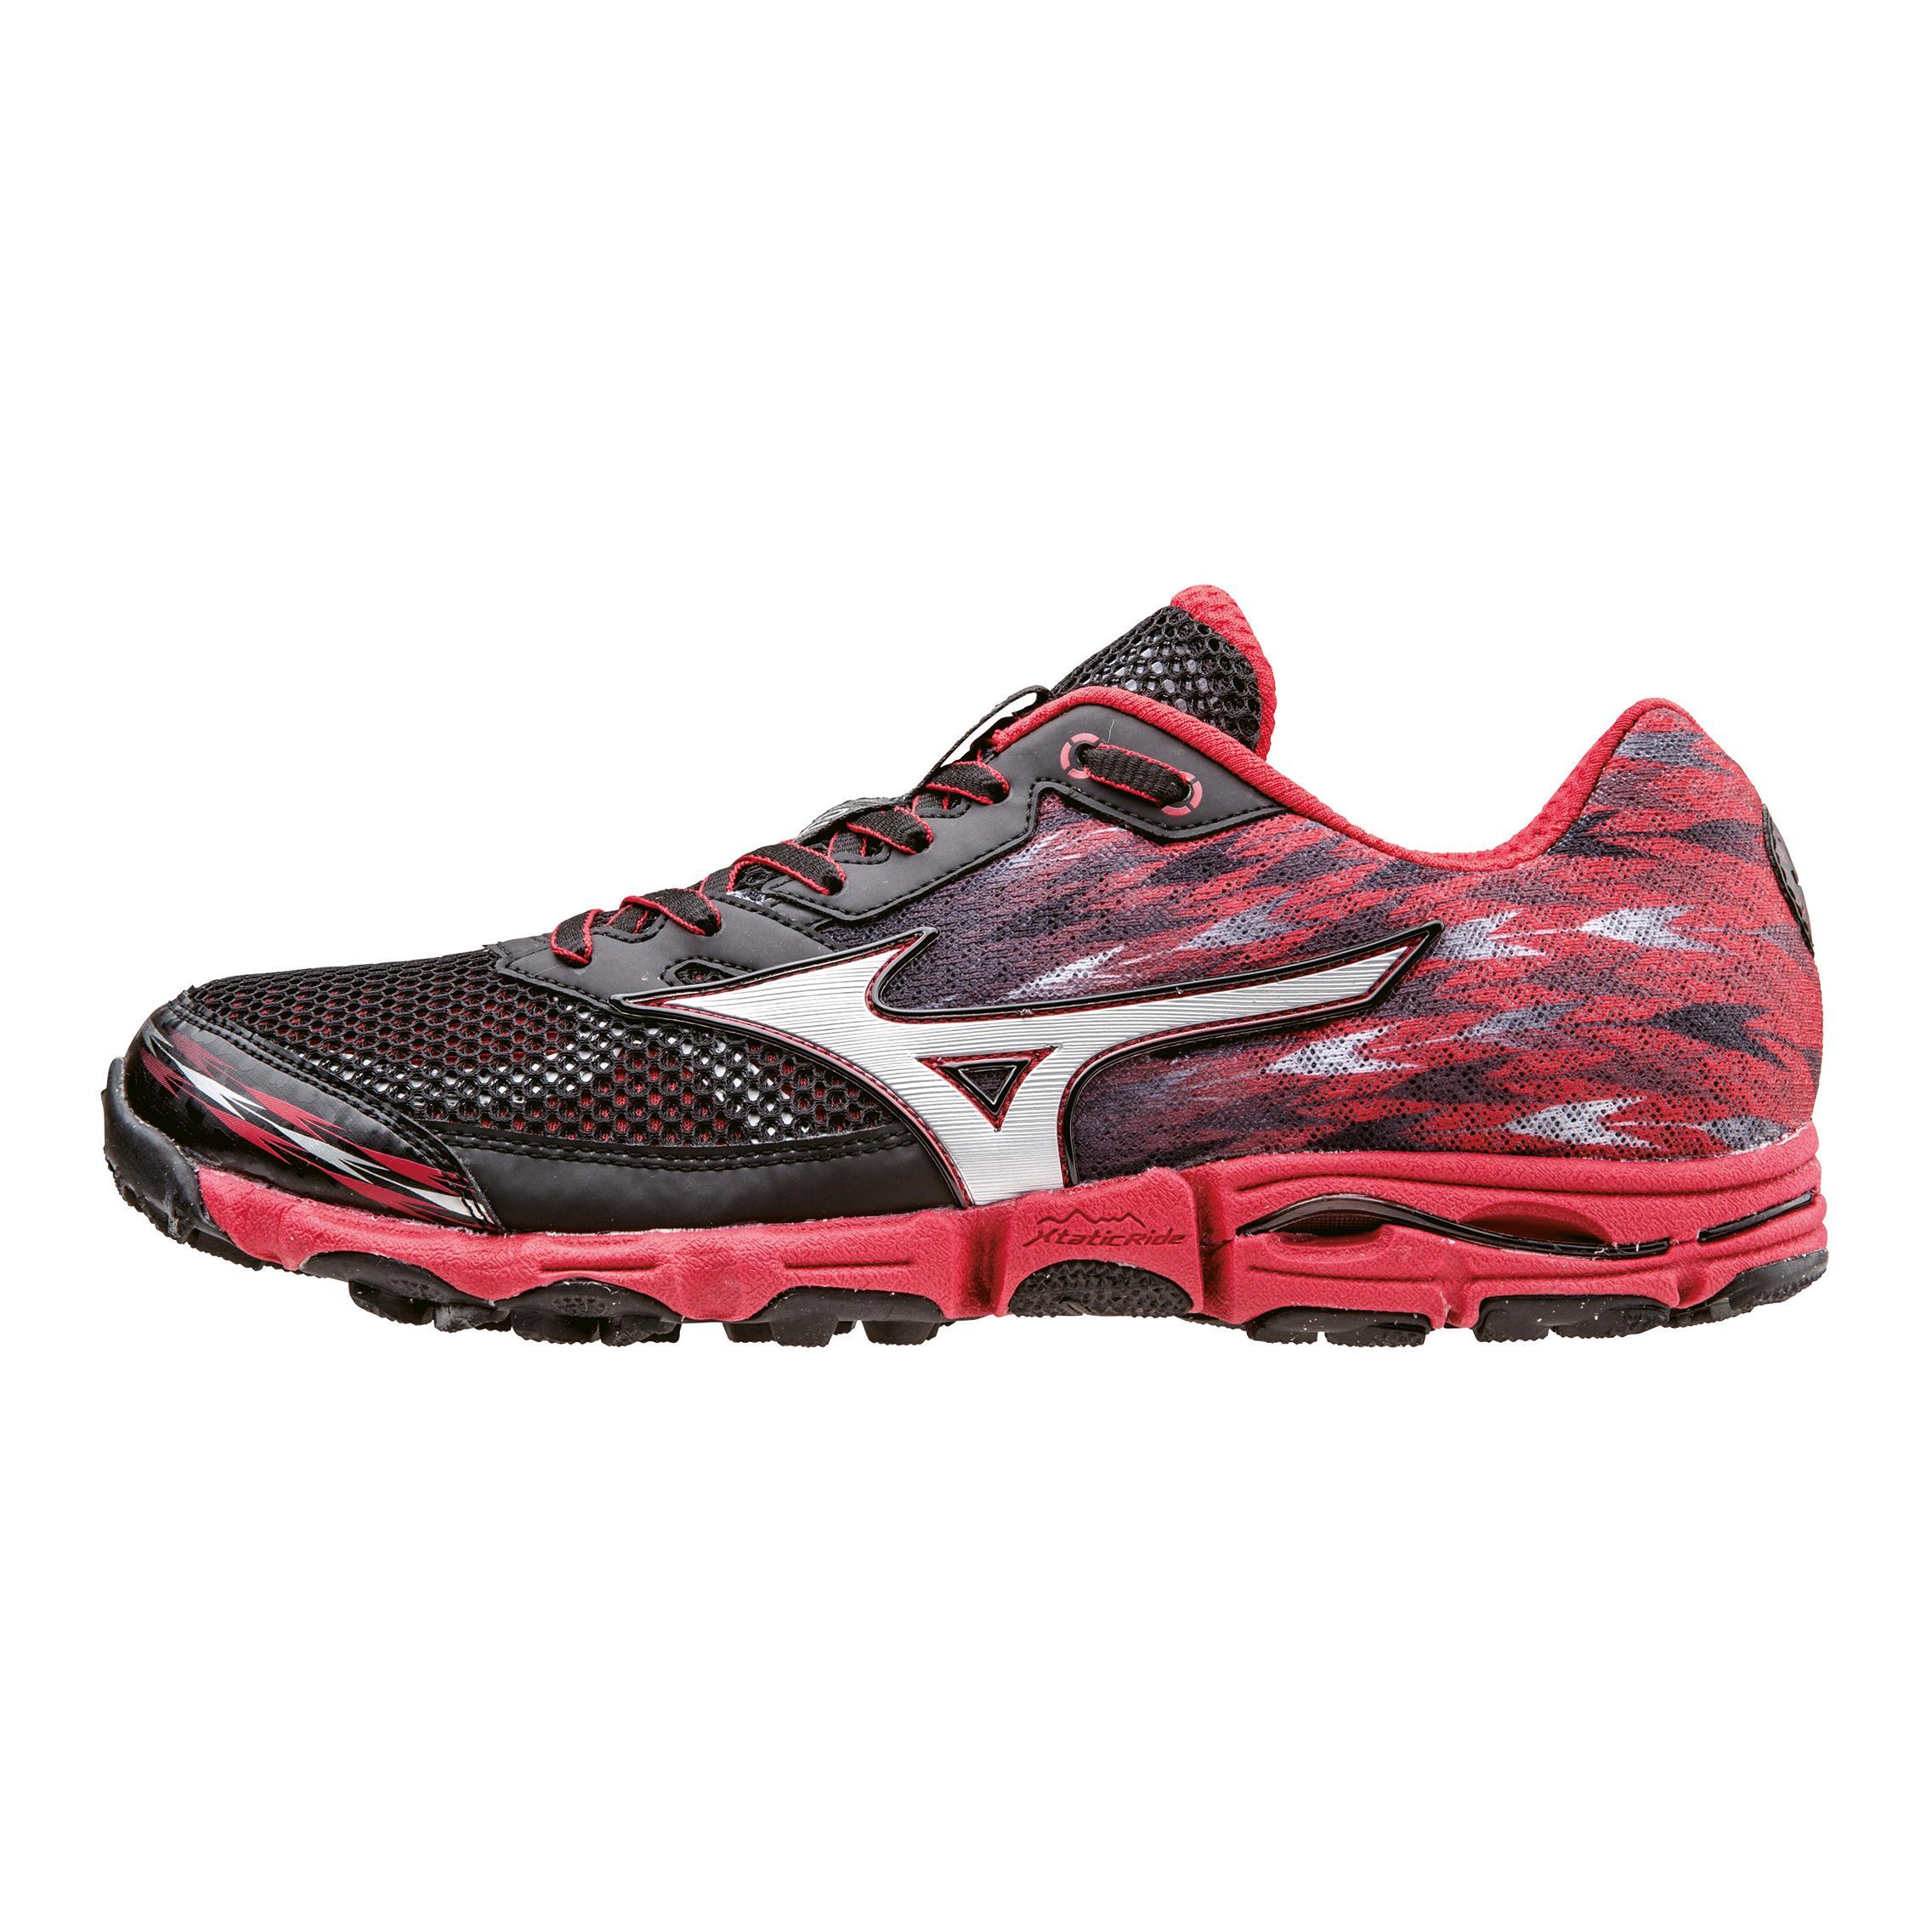 Mizuno Womens Wave Daichi 3 Trail Running Shoes Trainers Baskets Purple Sports-afficher le titre d'origine